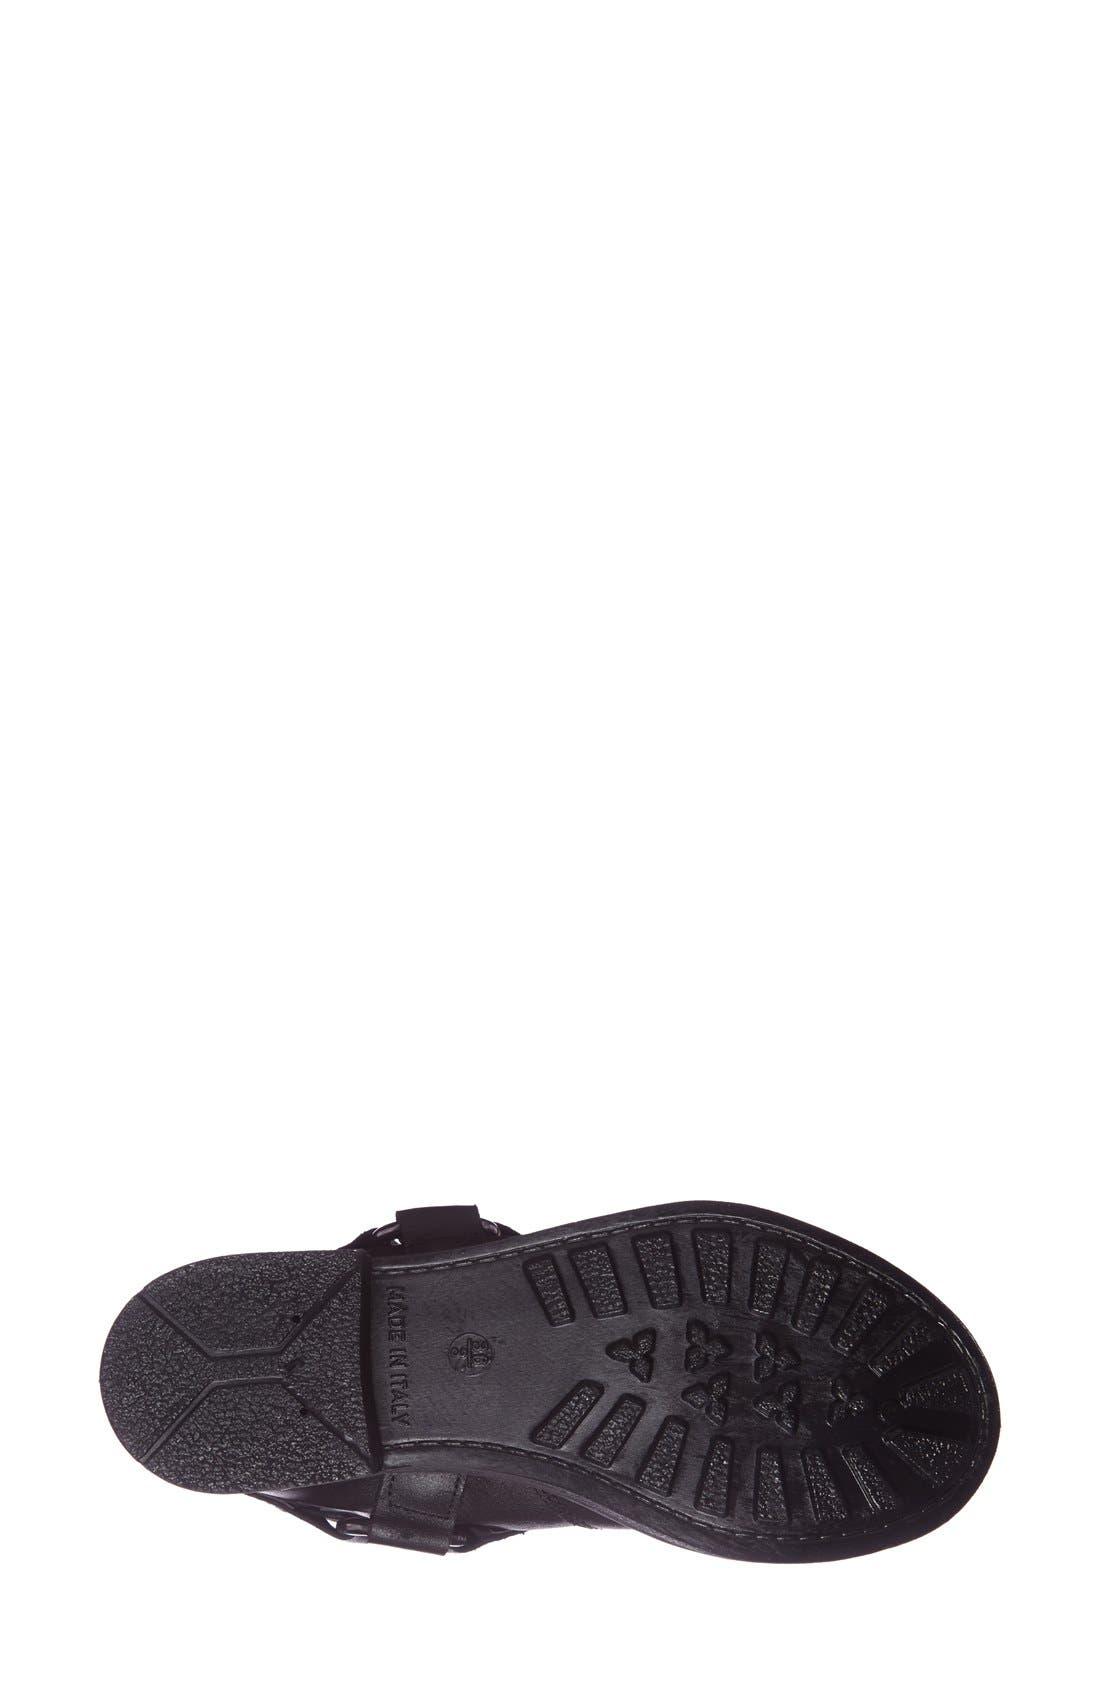 Alternate Image 4  - Topshop 'Buster' Leather Harness Biker Boot (Women)